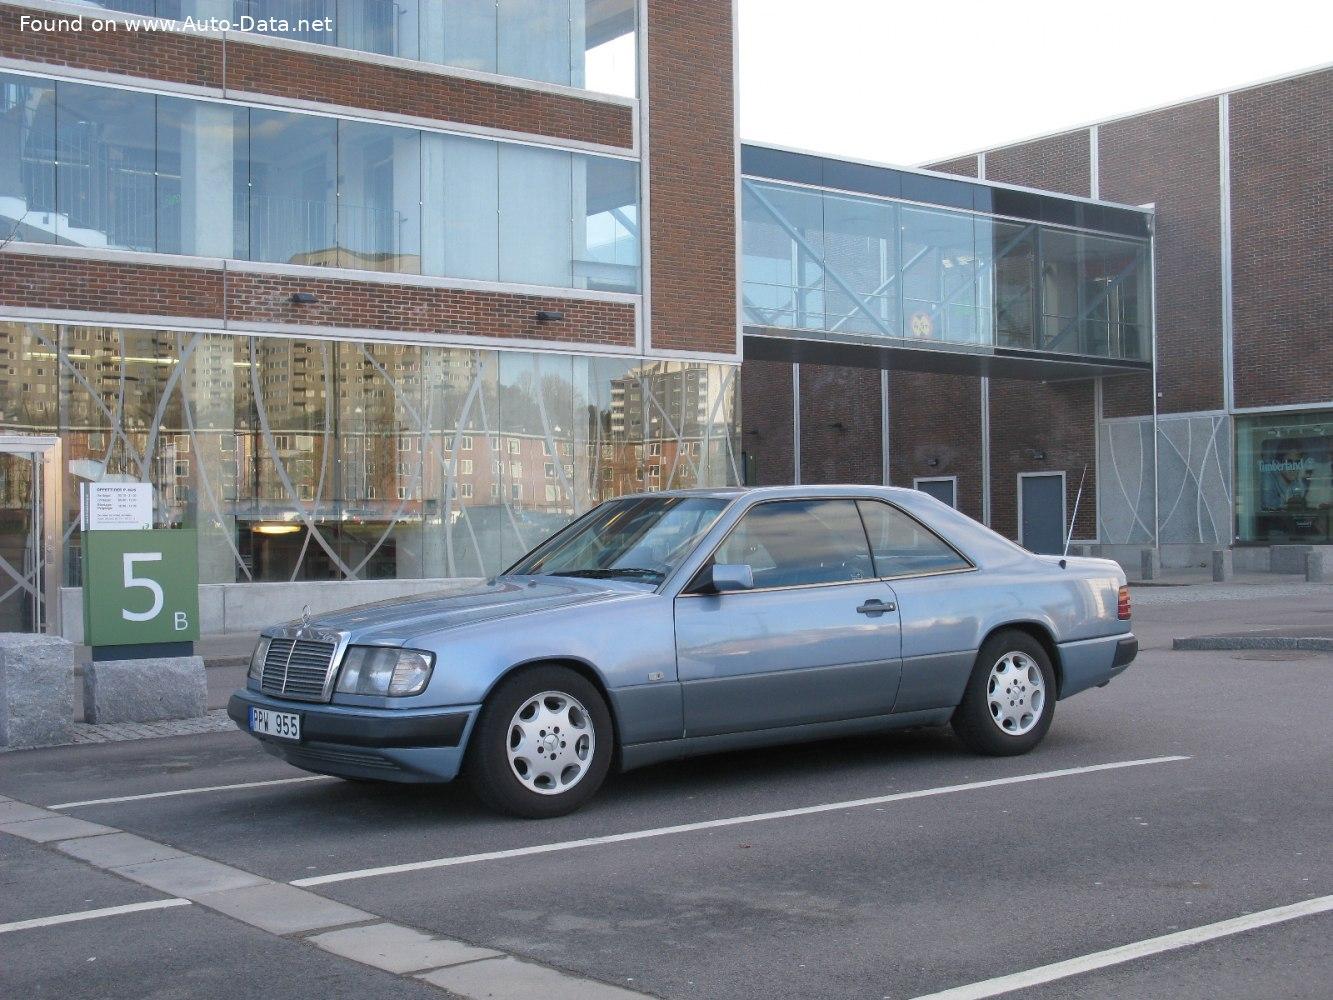 Mercedes Benz Coupe >> Mercedes Benz Coupe C124 300 Ce 124 050 180 Hp